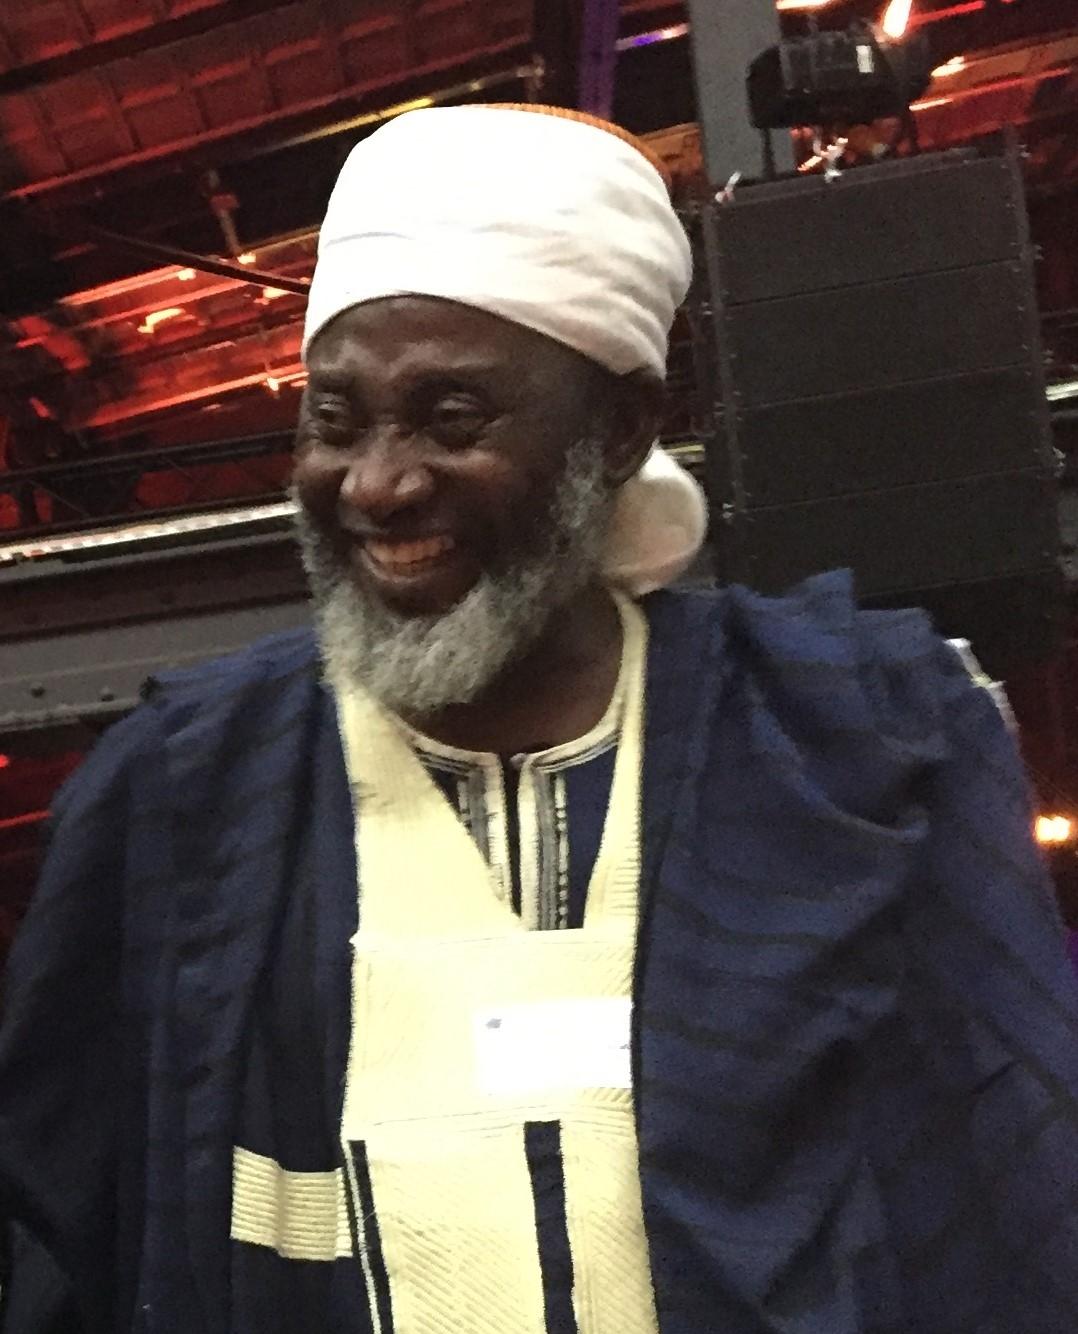 Imam Muhammad Nurayn Ashafa, Deputy Chief of Party, IMC. Phone number: 0803-450-2936. Email: ashafamqsfoundation@yahoo.com